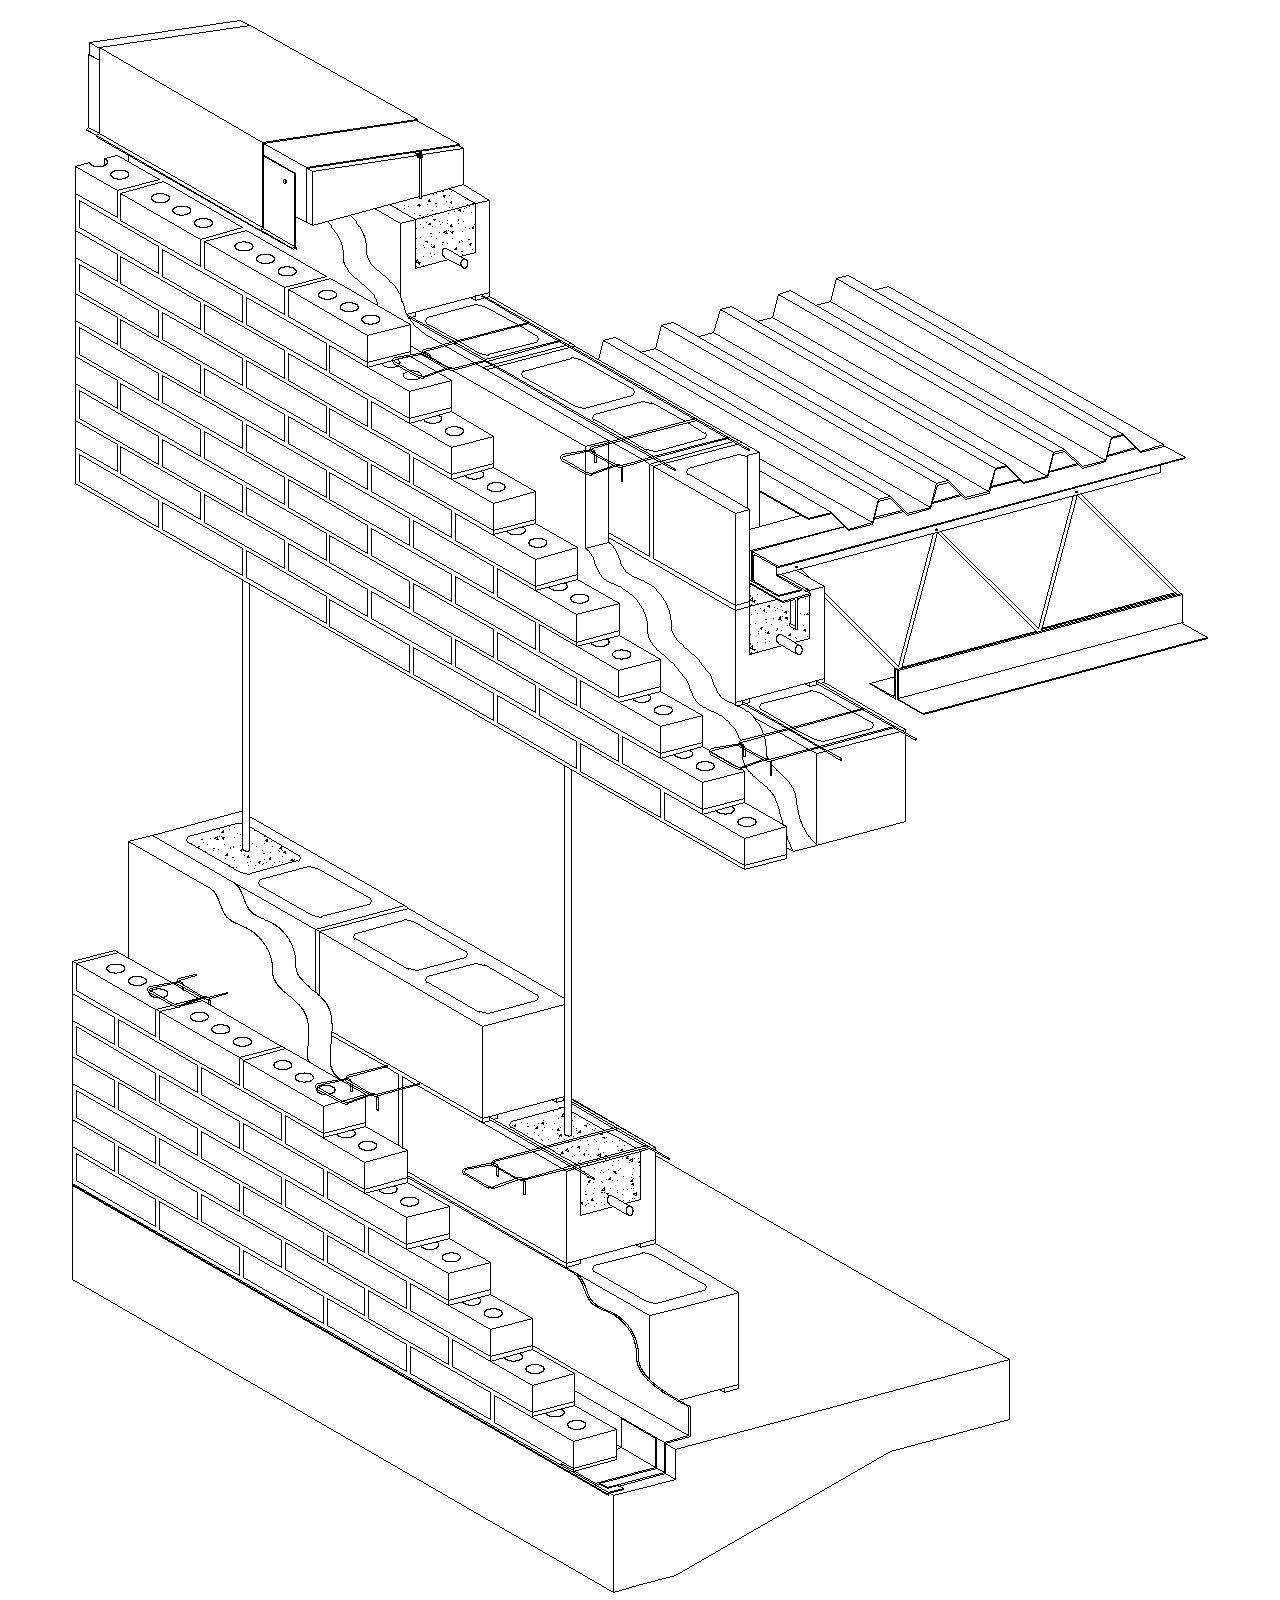 Cavity Wall: Brick Veneer/Reinforced Concrete Block